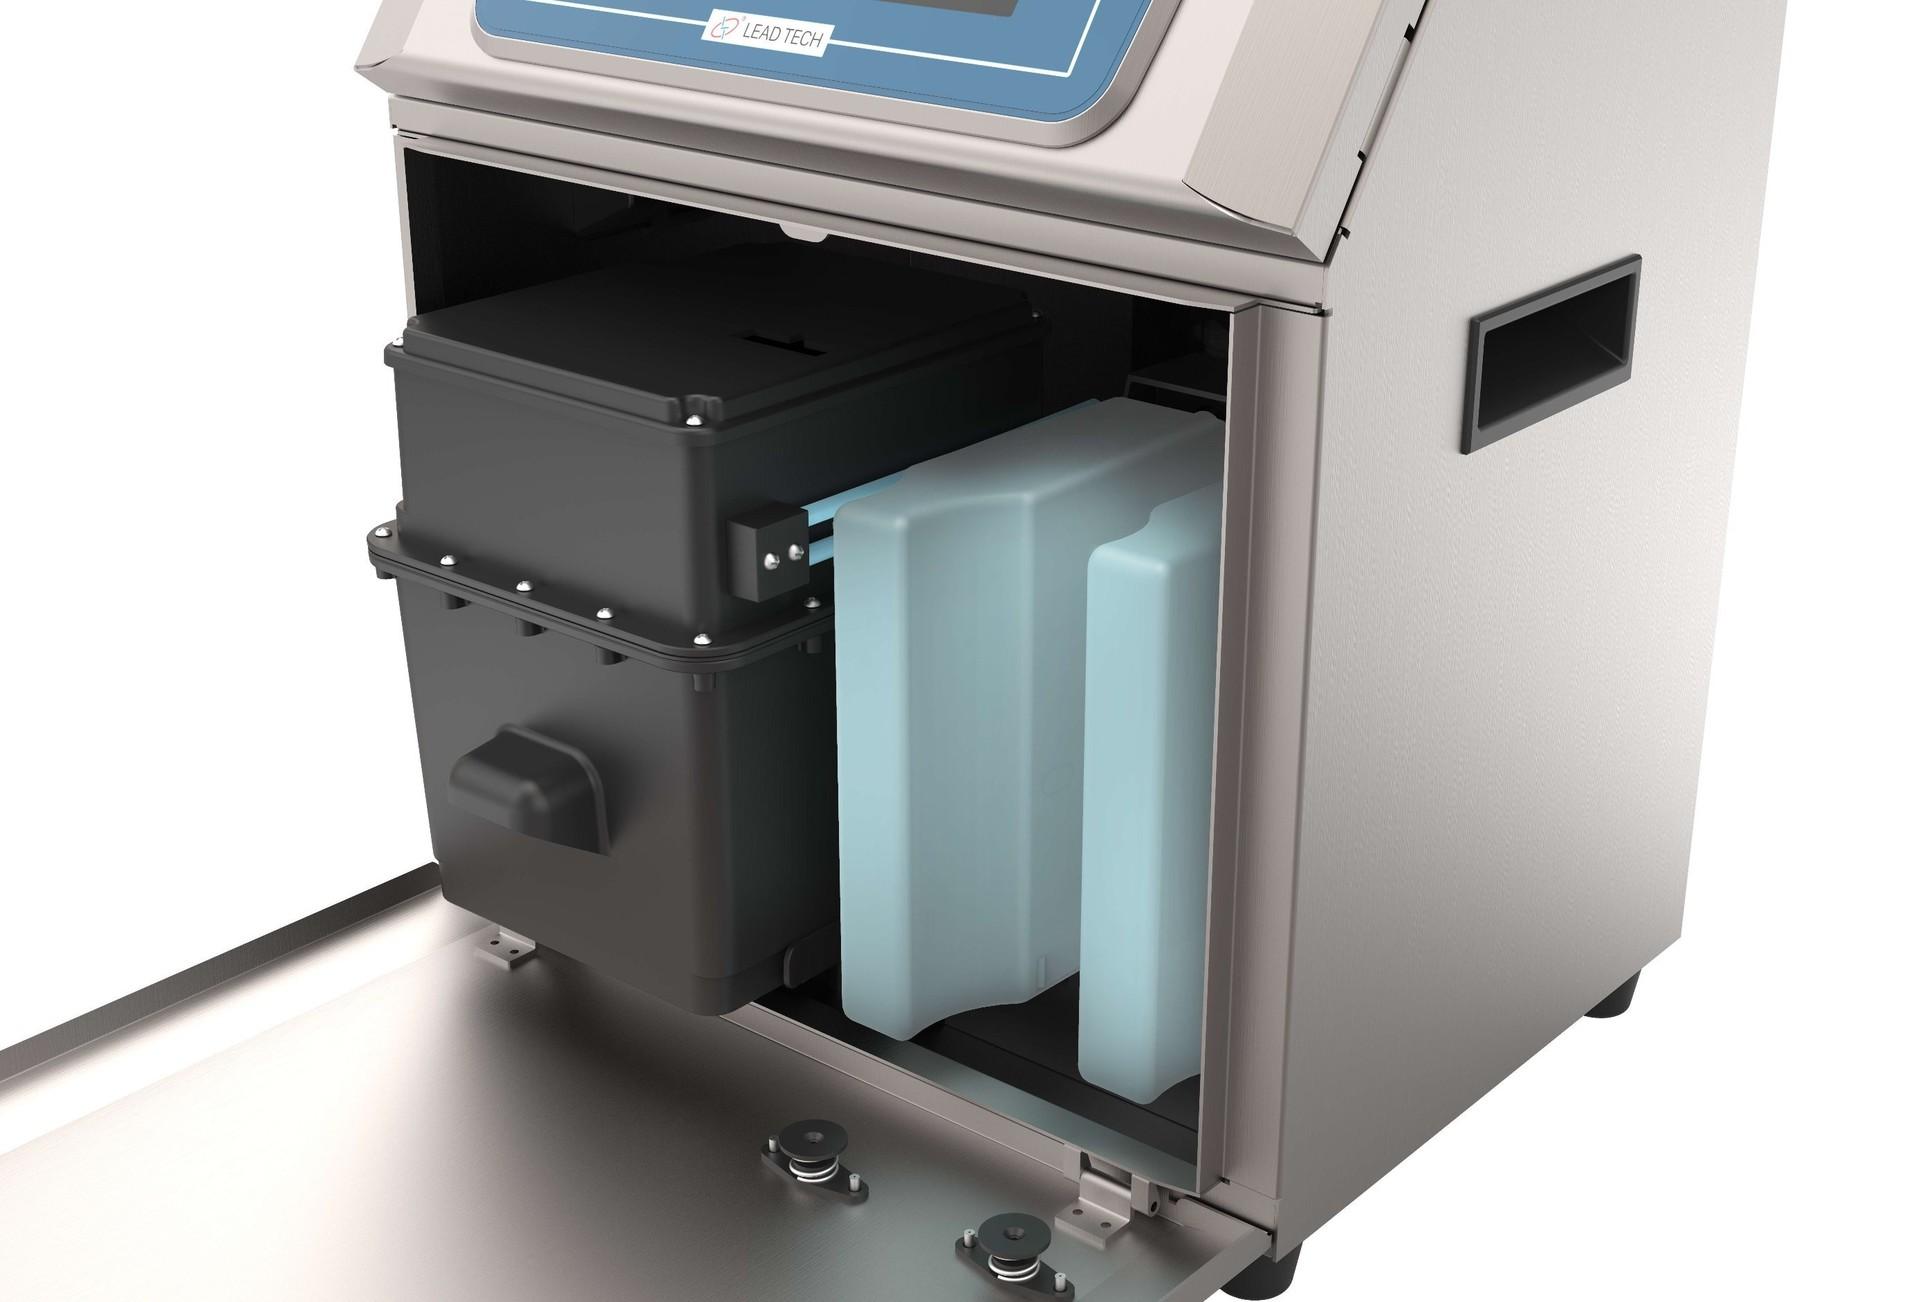 Lead Tech Lt800 Expiry Date Code Number Warranty Automatic Cij Inkjet Printer